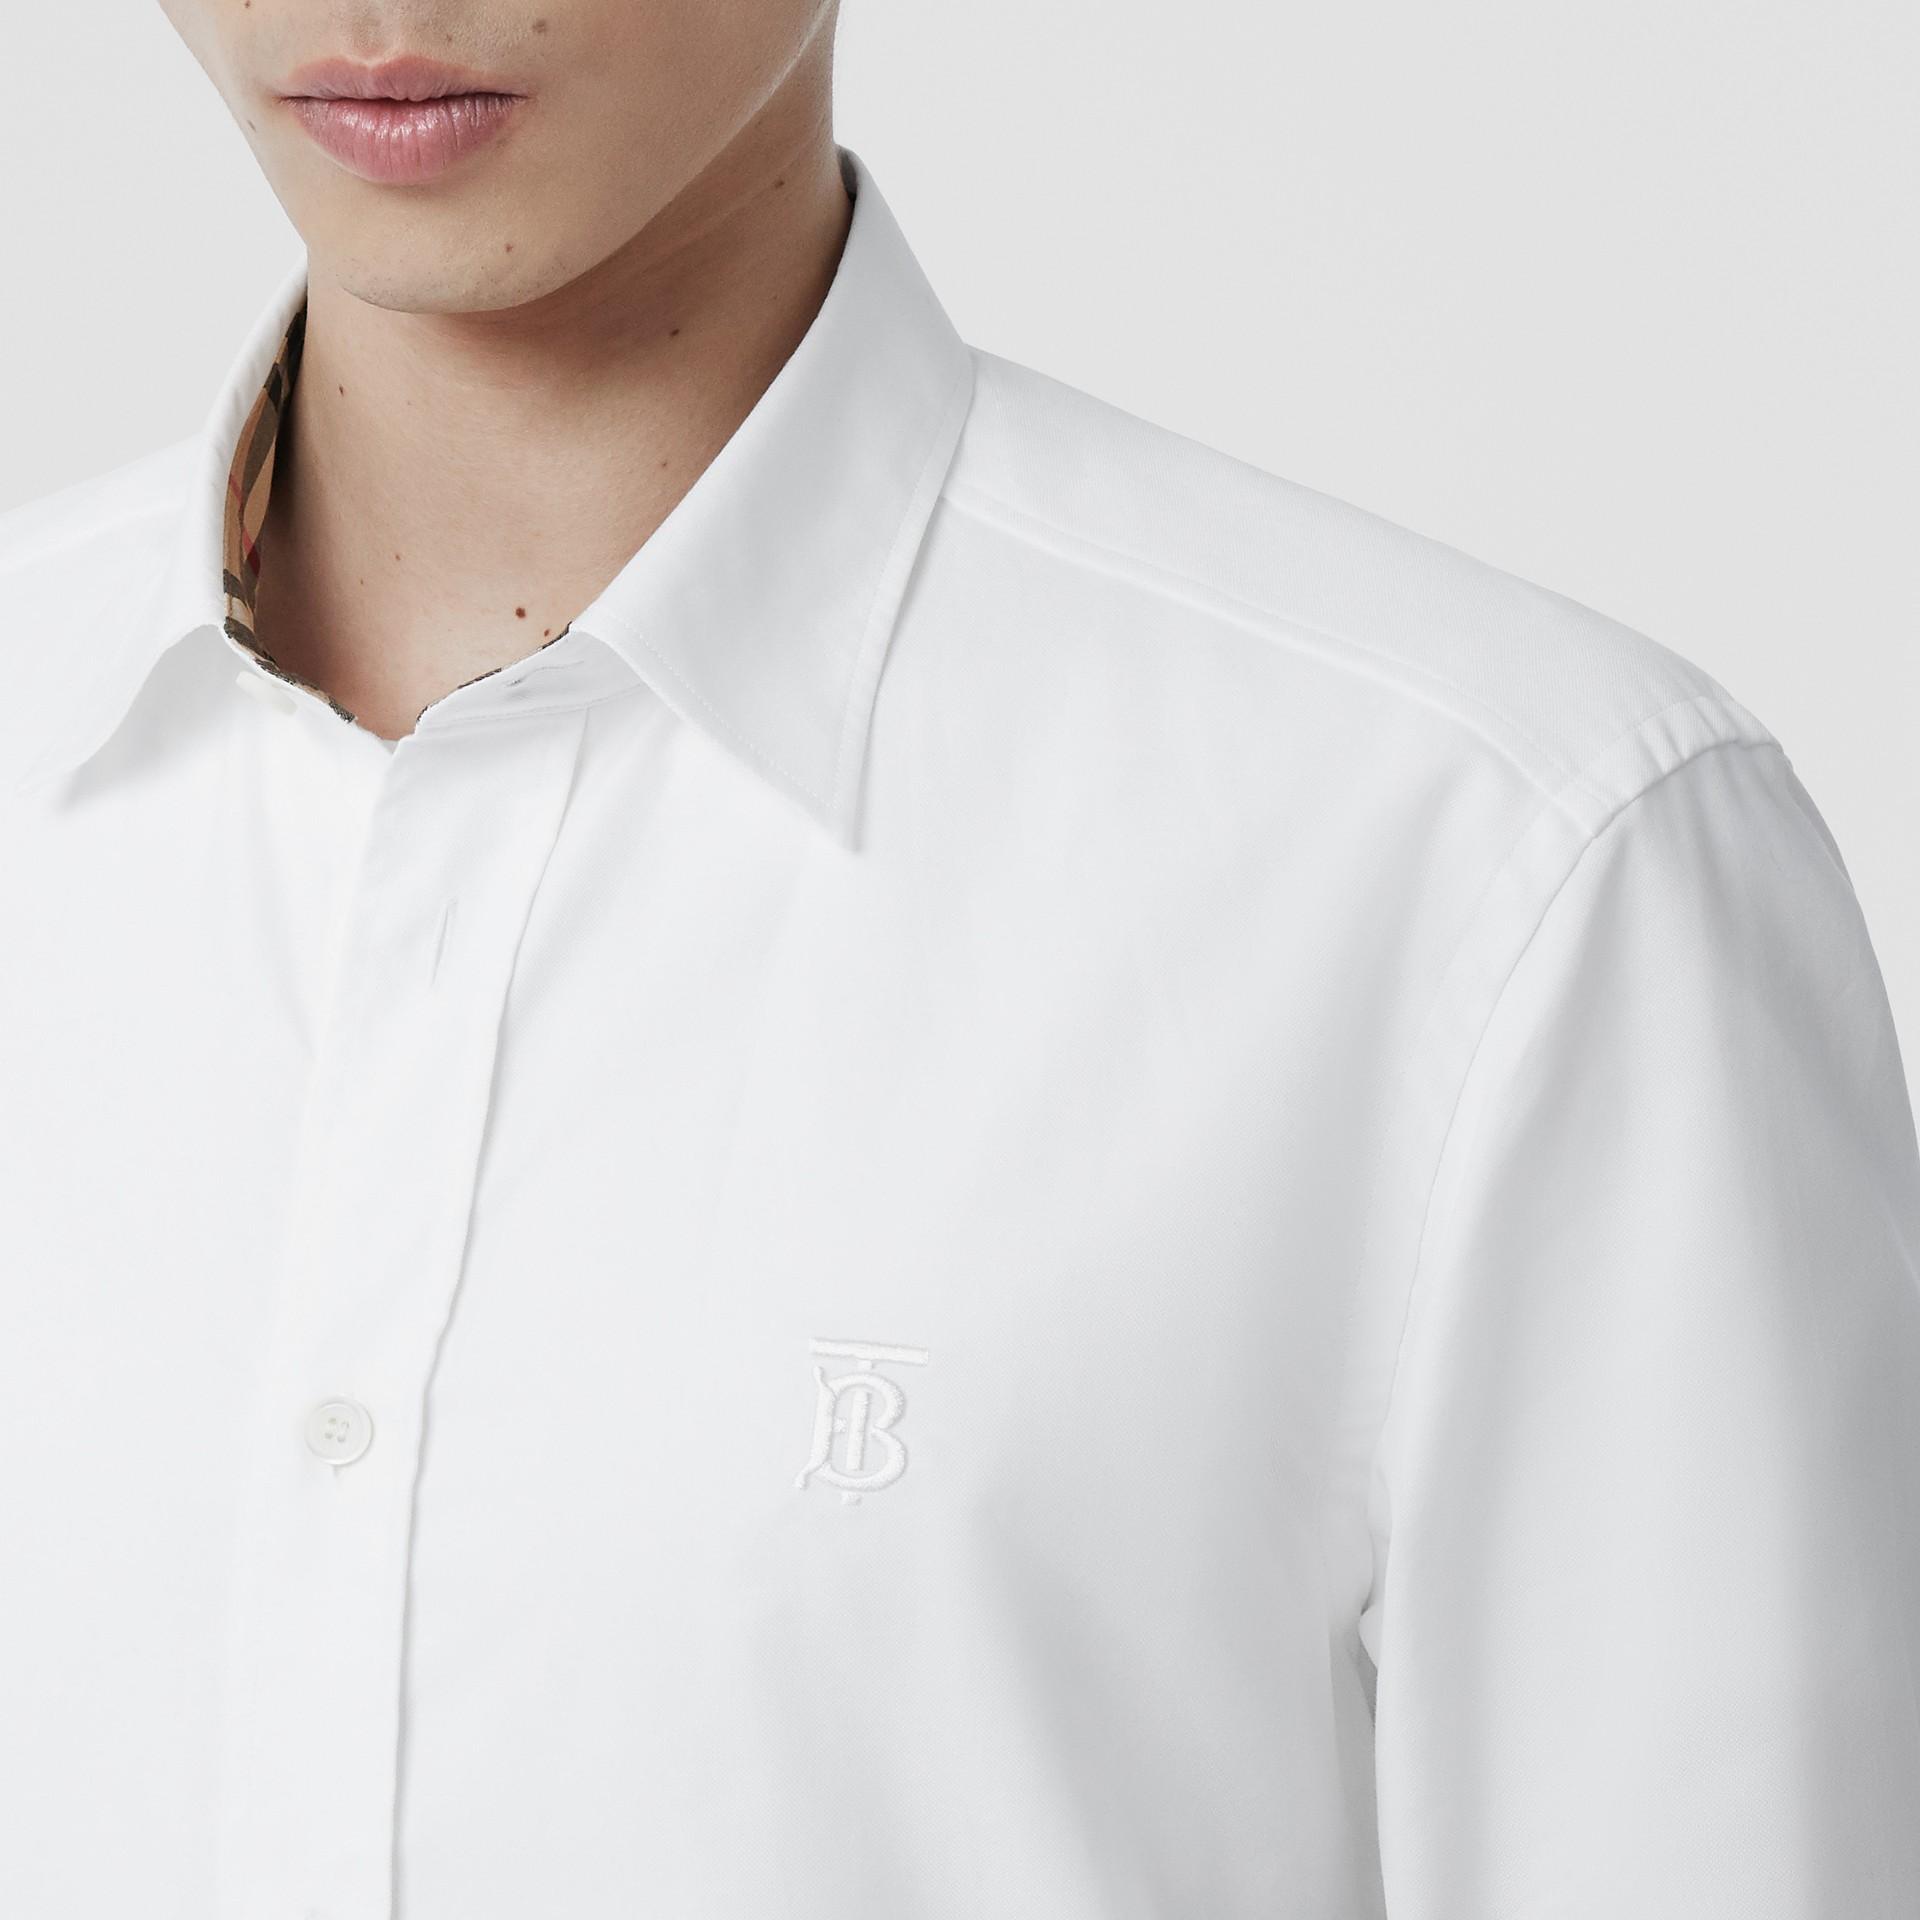 Monogram Motif Cotton Oxford Shirt in White - Men | Burberry Hong Kong S.A.R - gallery image 1